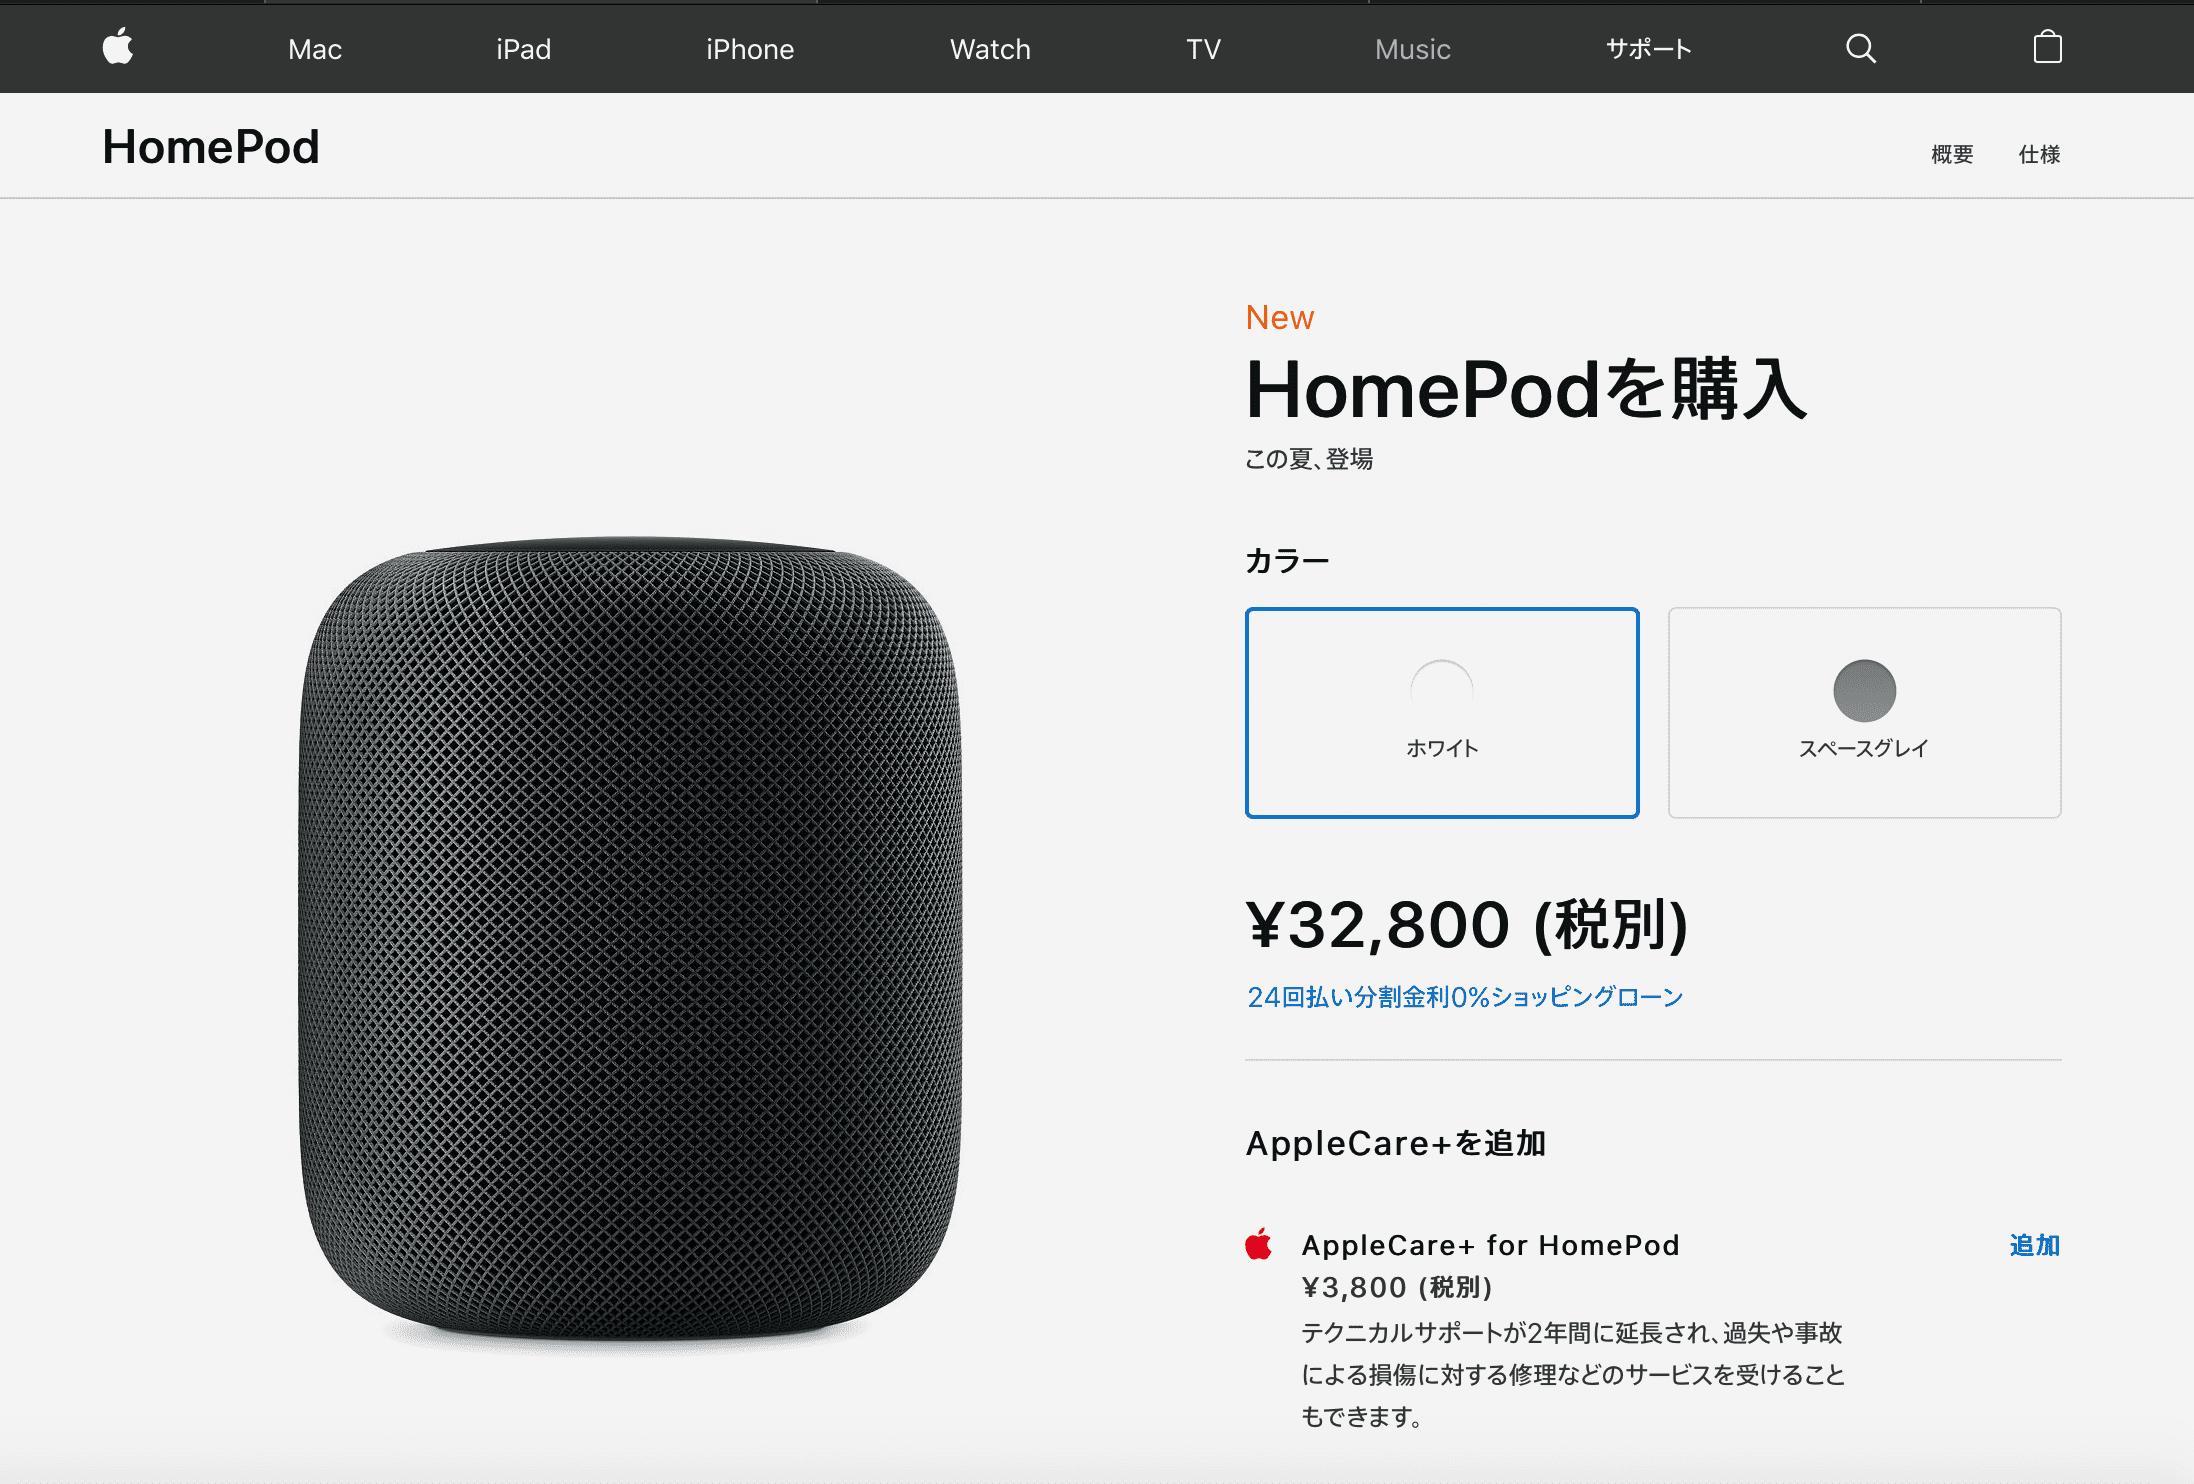 Apple Comfirm Release Homepod Japan Soon Img 2